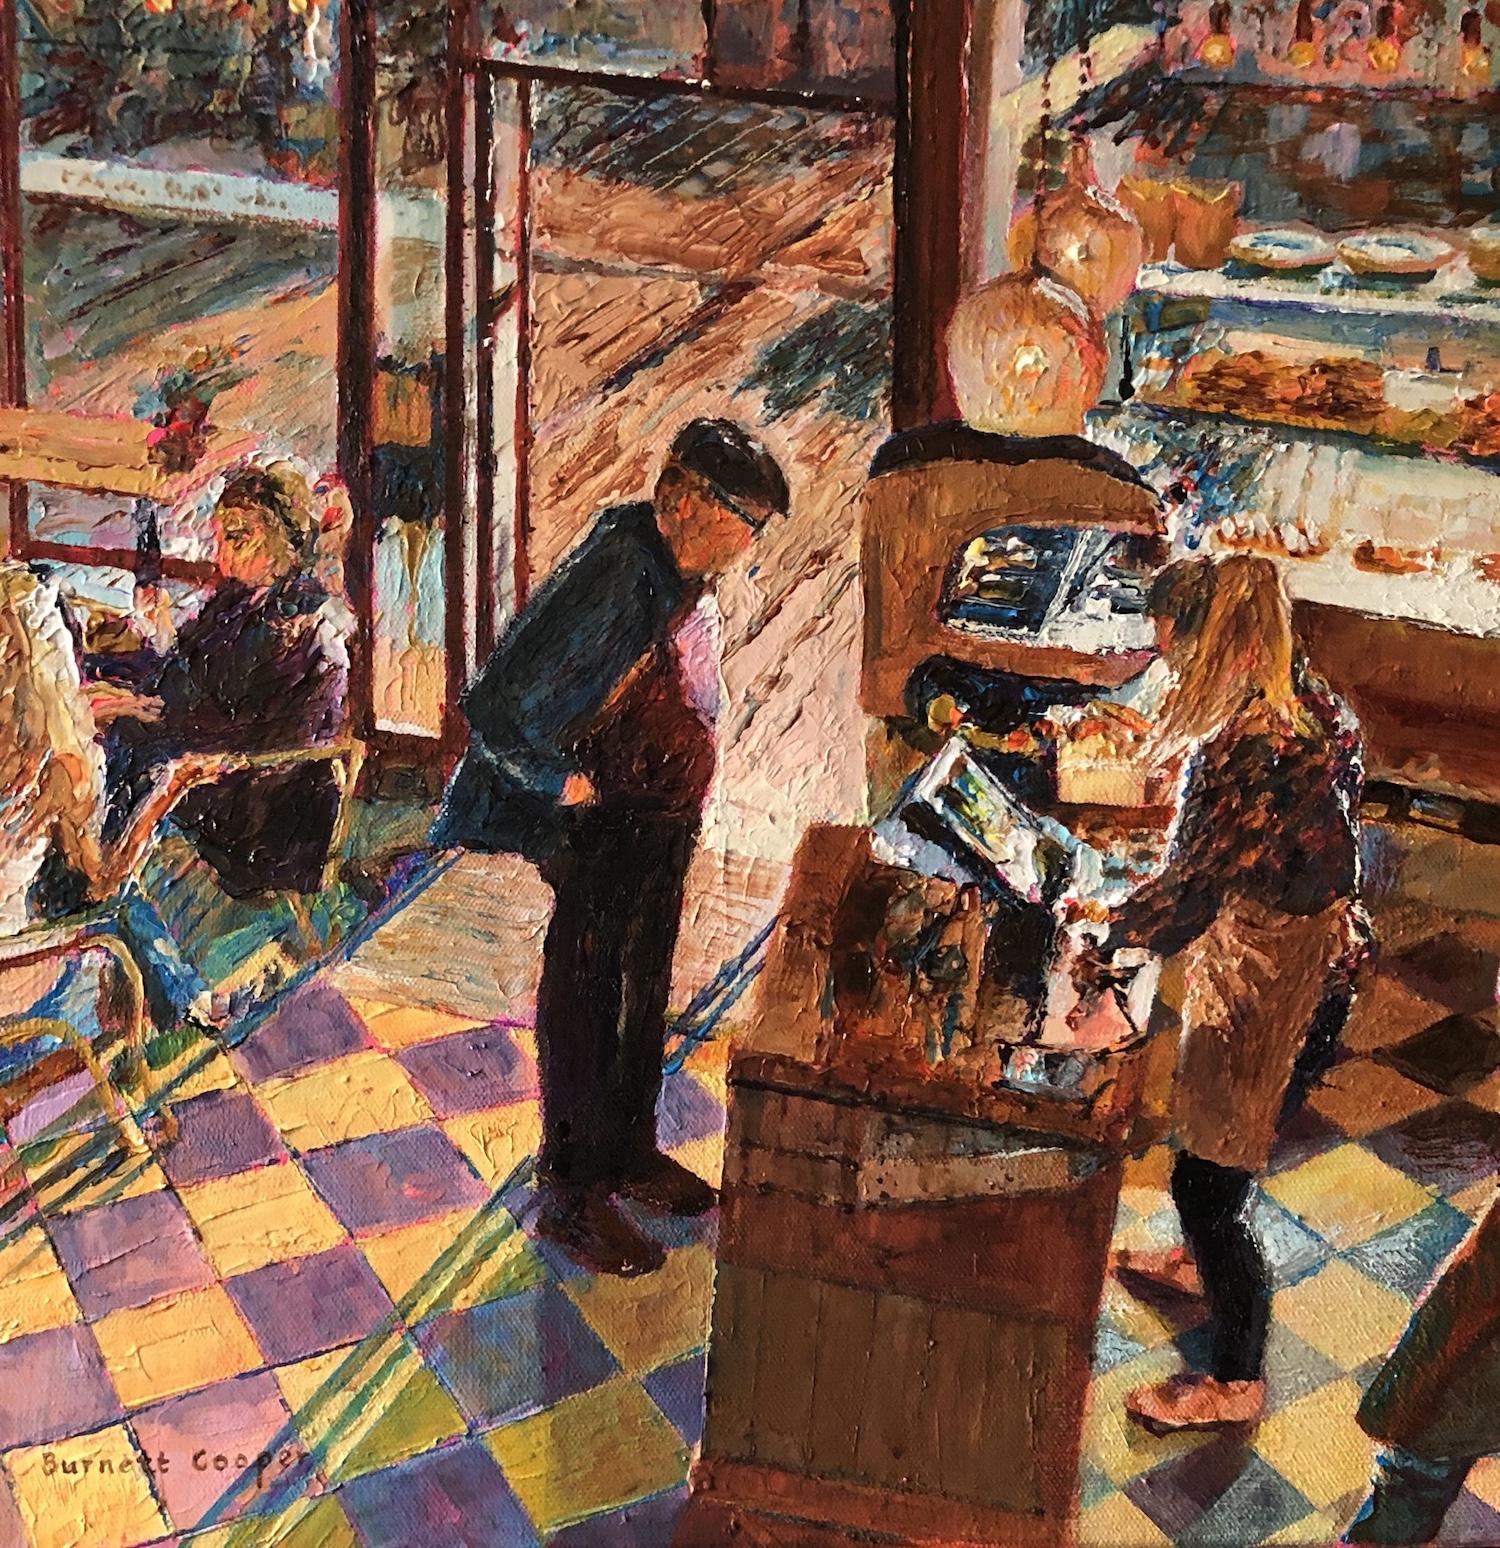 Cafe Shadows, York. Hilary Burnett Cooper. Jackson's Painting Prize.